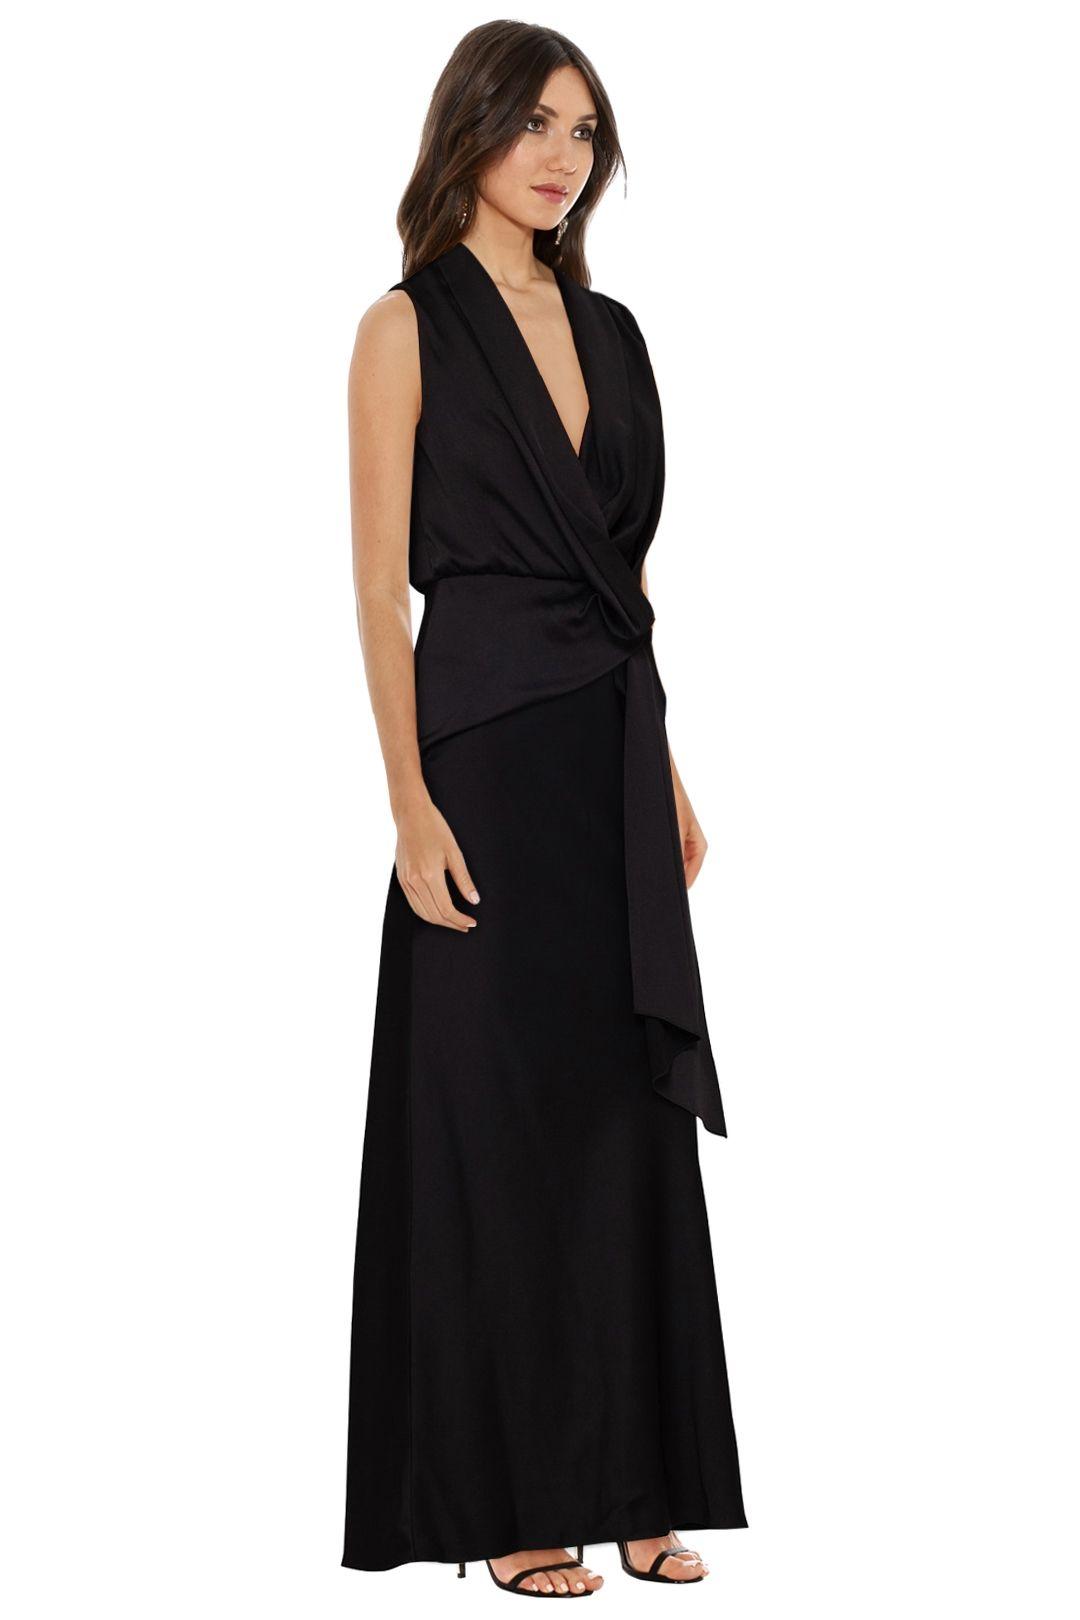 Camilla and Marc - Dahlia Dress - Black - Side